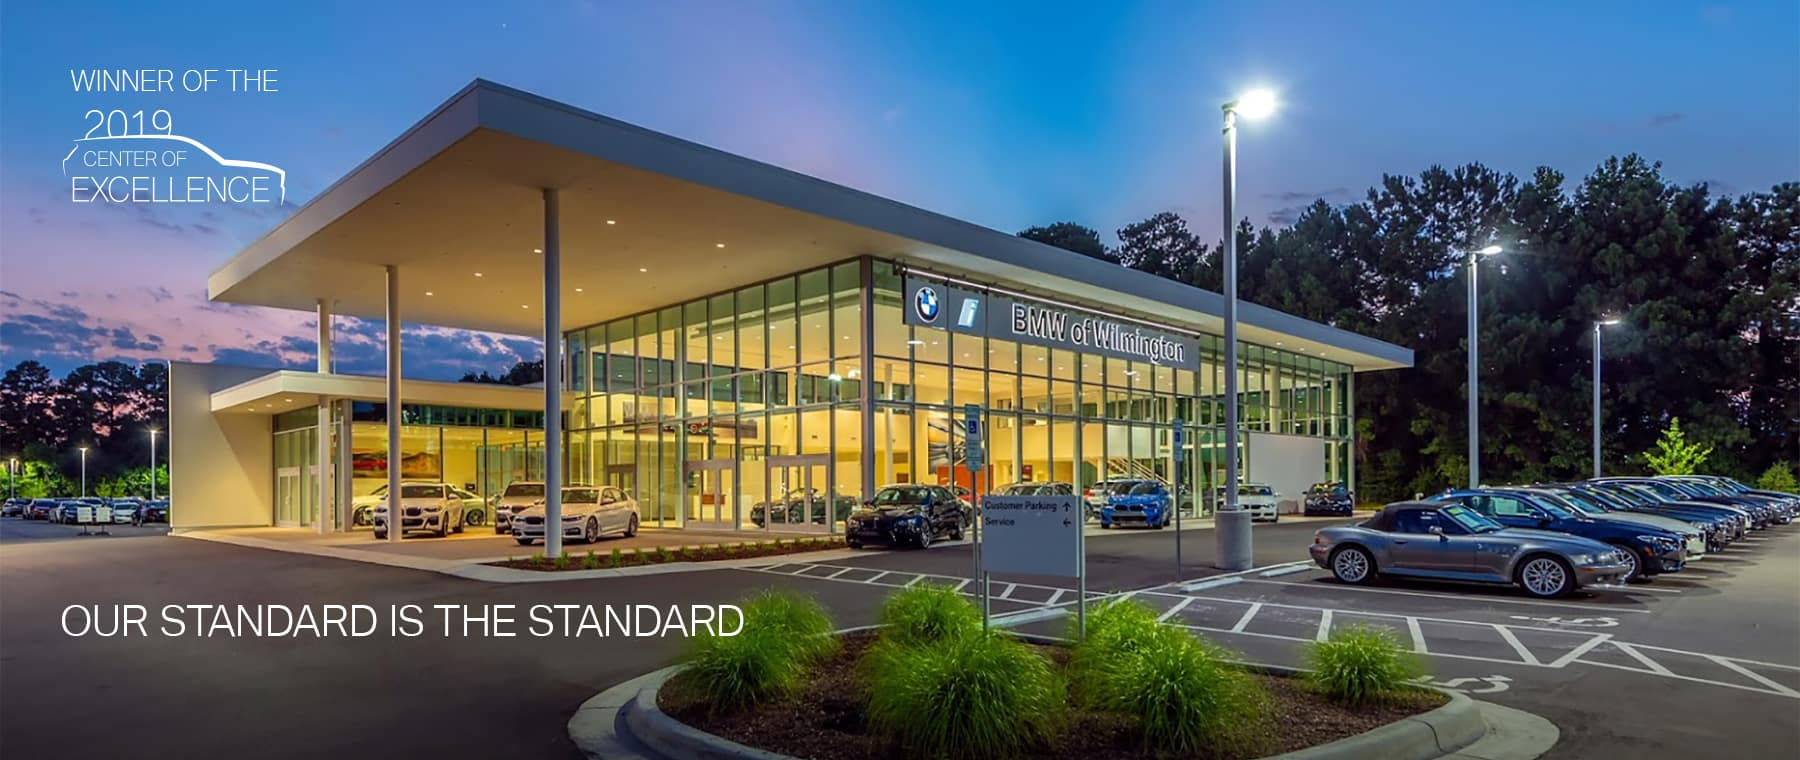 Car Dealerships Wilmington Nc >> Bmw Dealership Wilmington Nc Leland Jacksonville